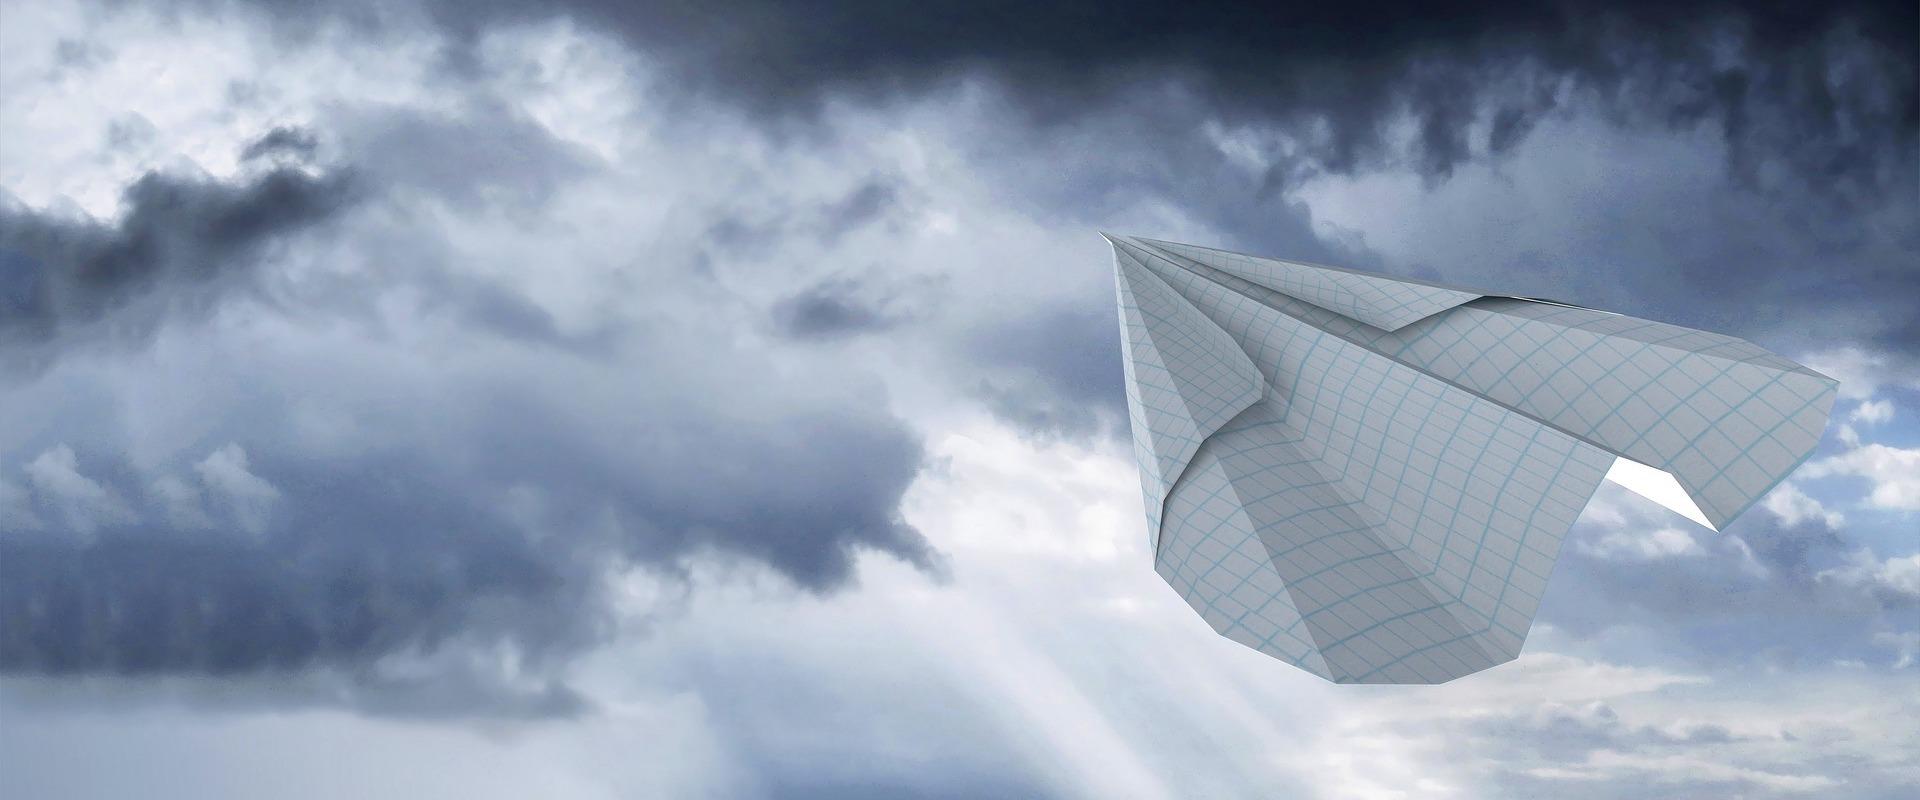 Cloud Software offerings